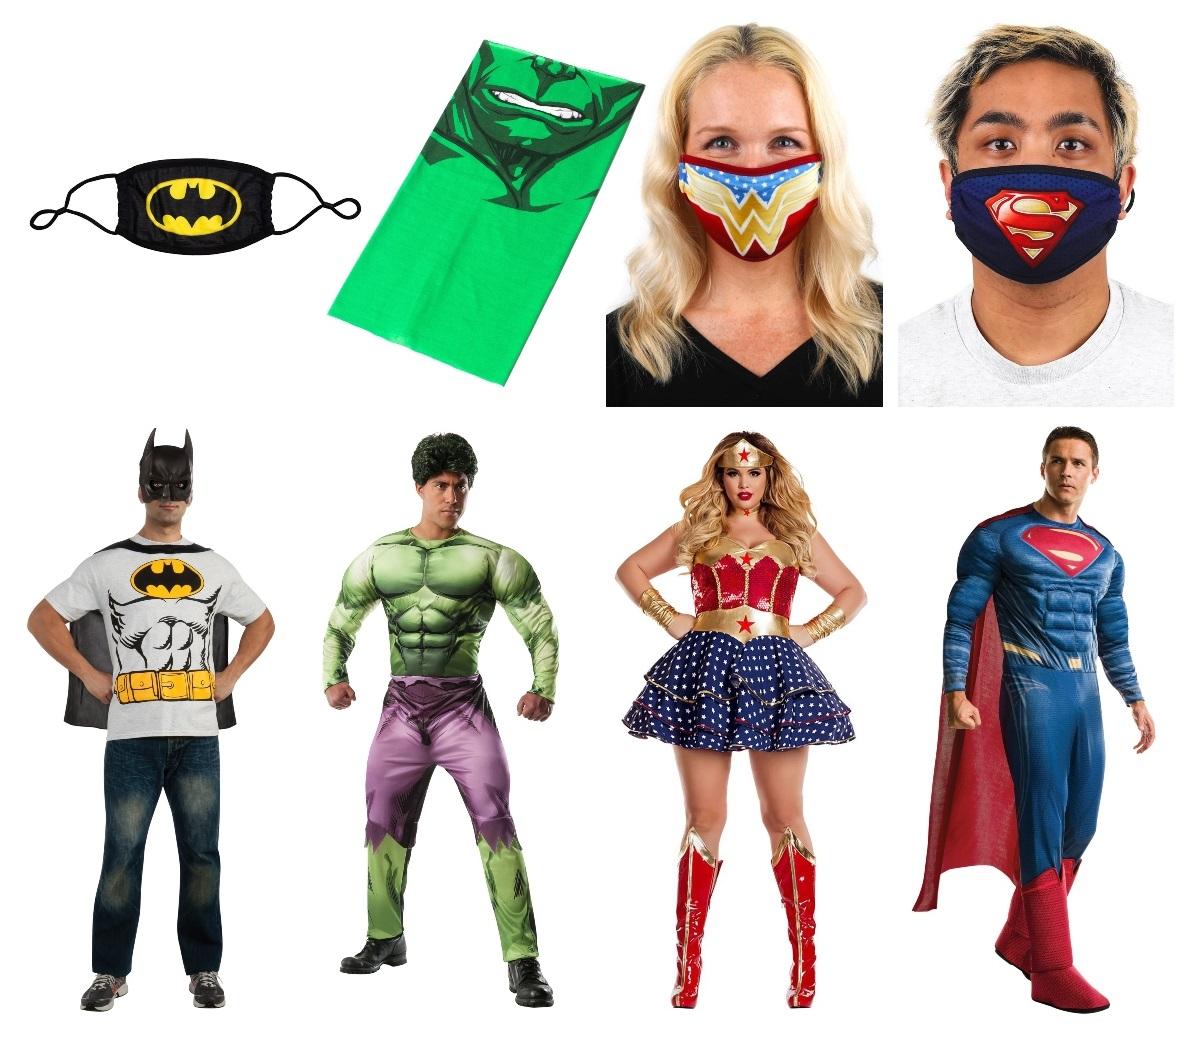 Superhero Masks and Costumes